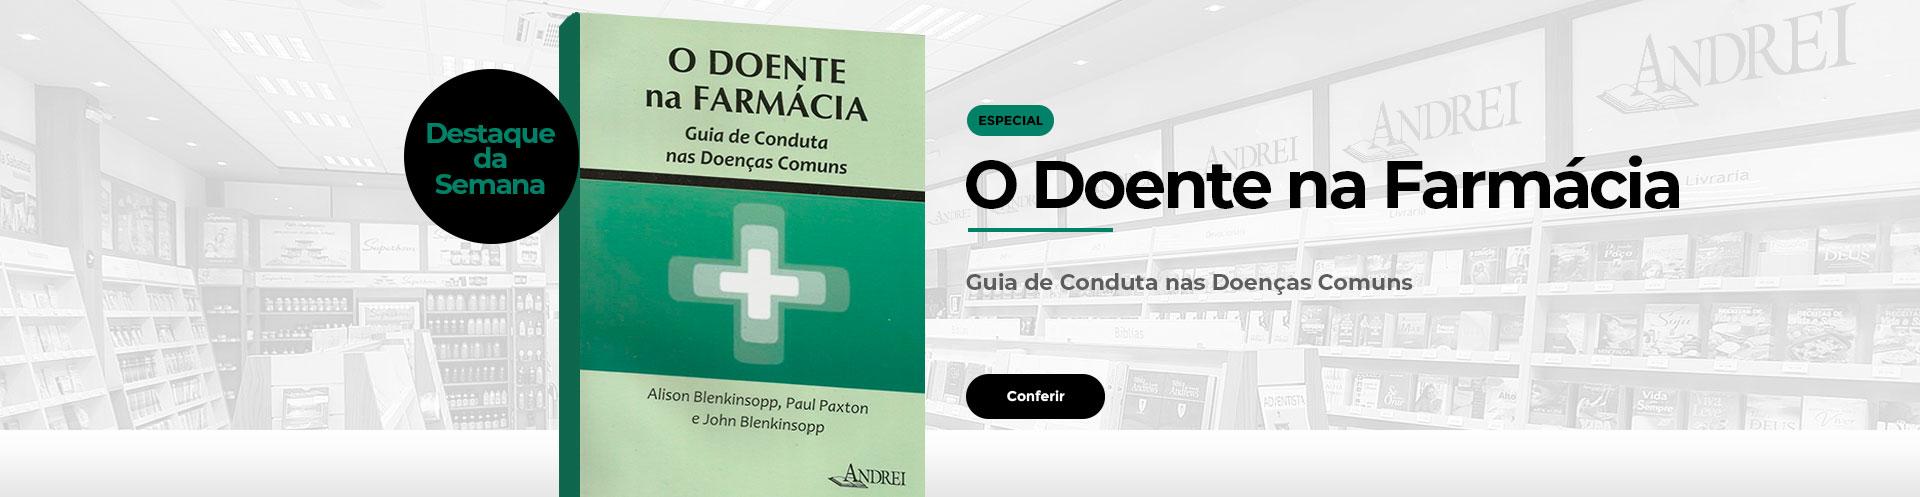 o doente na farmacia